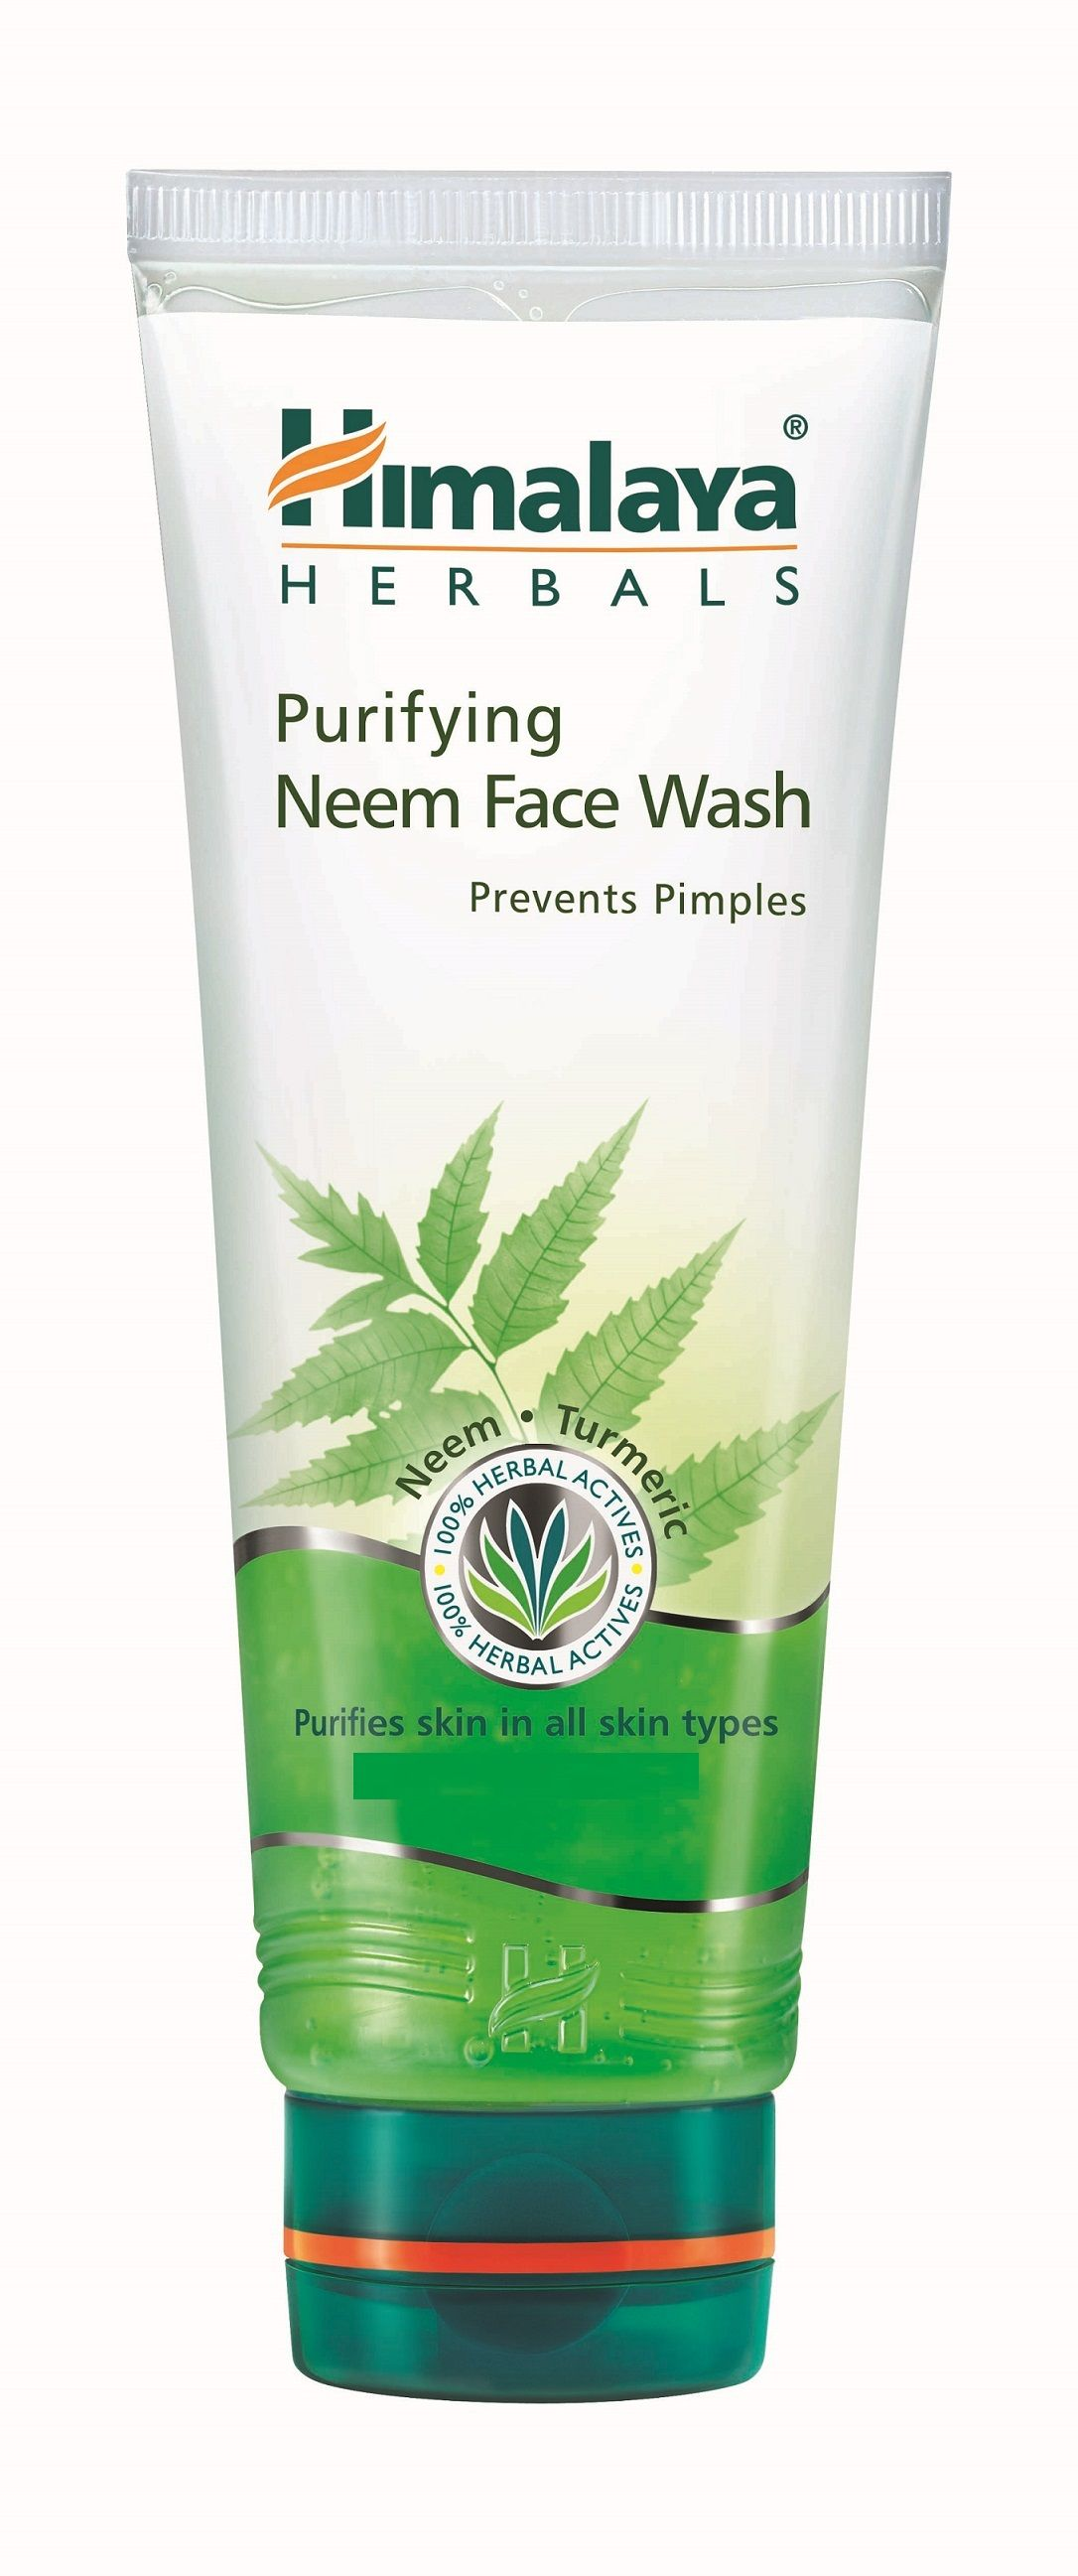 Himalaya Herbals Purifying Neem Face Wash 150ml